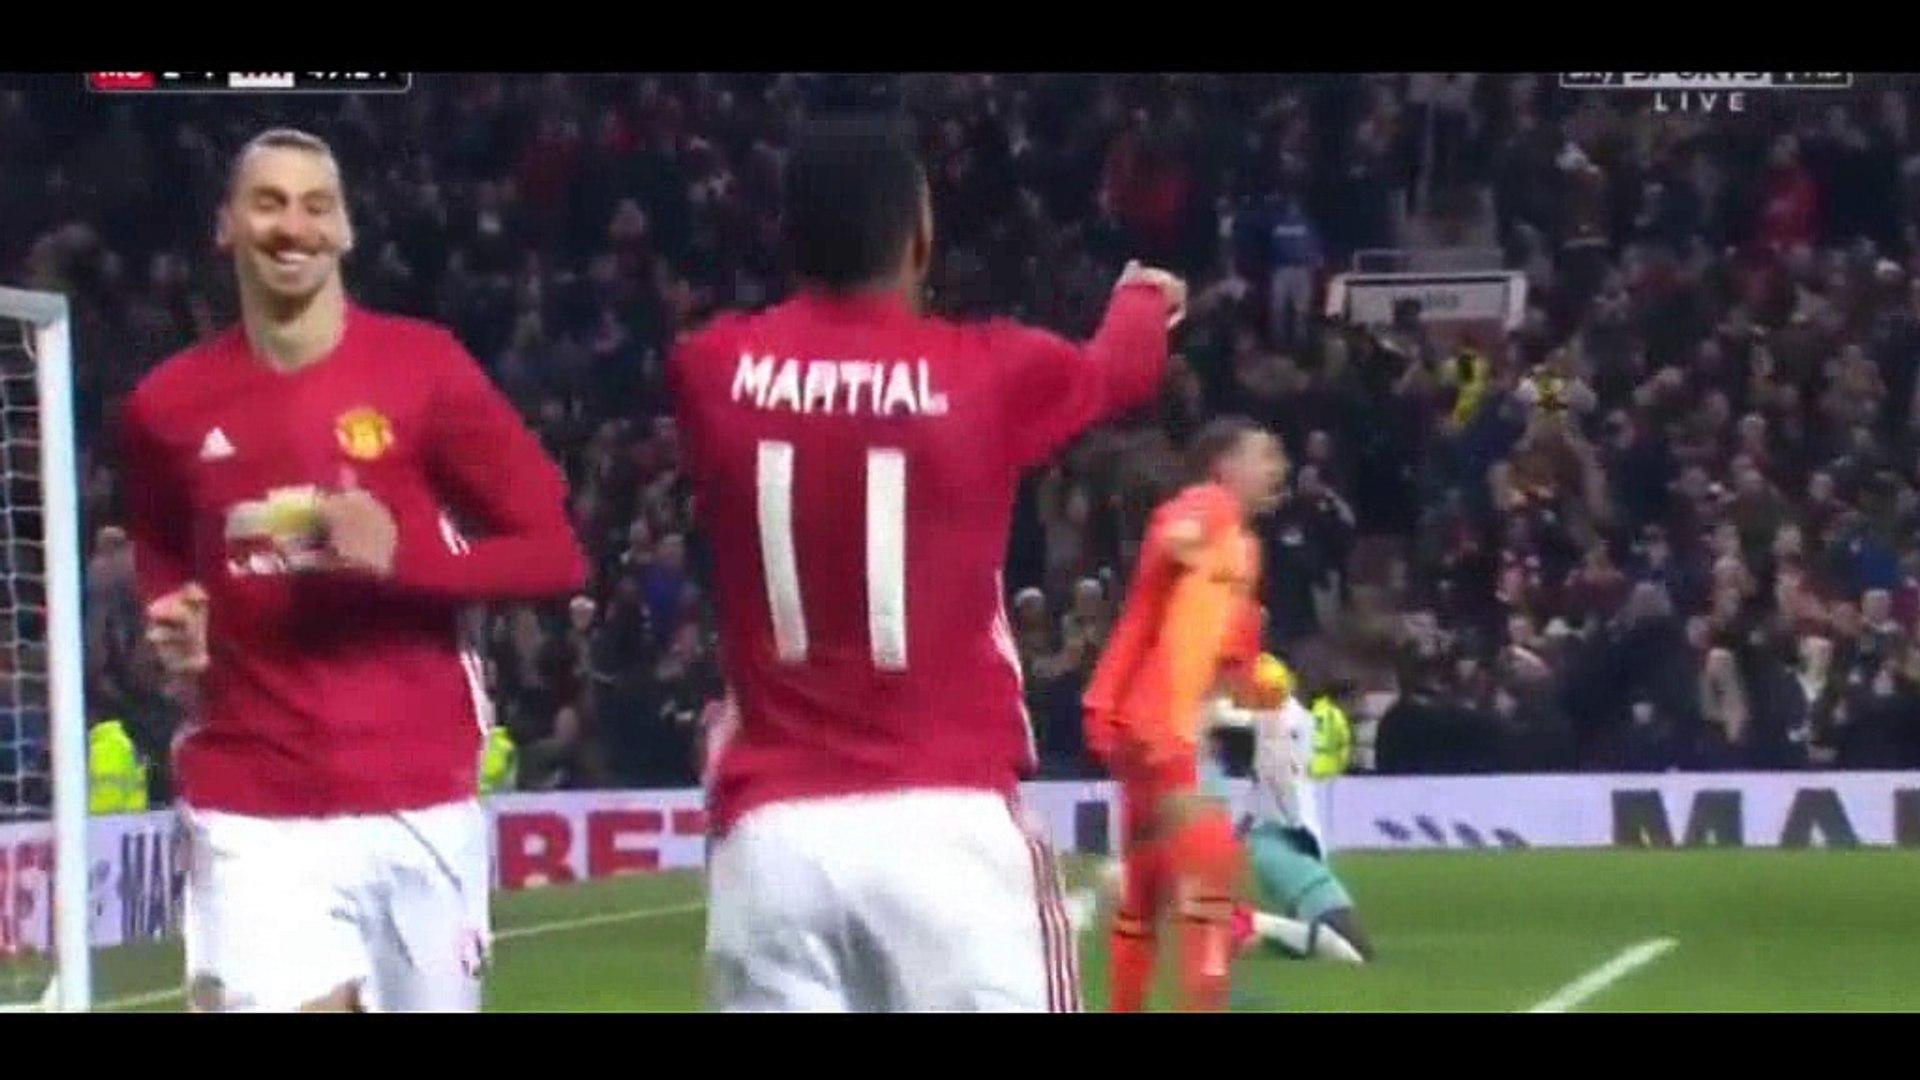 EFL Cup | Manchester United 4-1 West Ham United | Video bola, berita bola, cuplikan gol